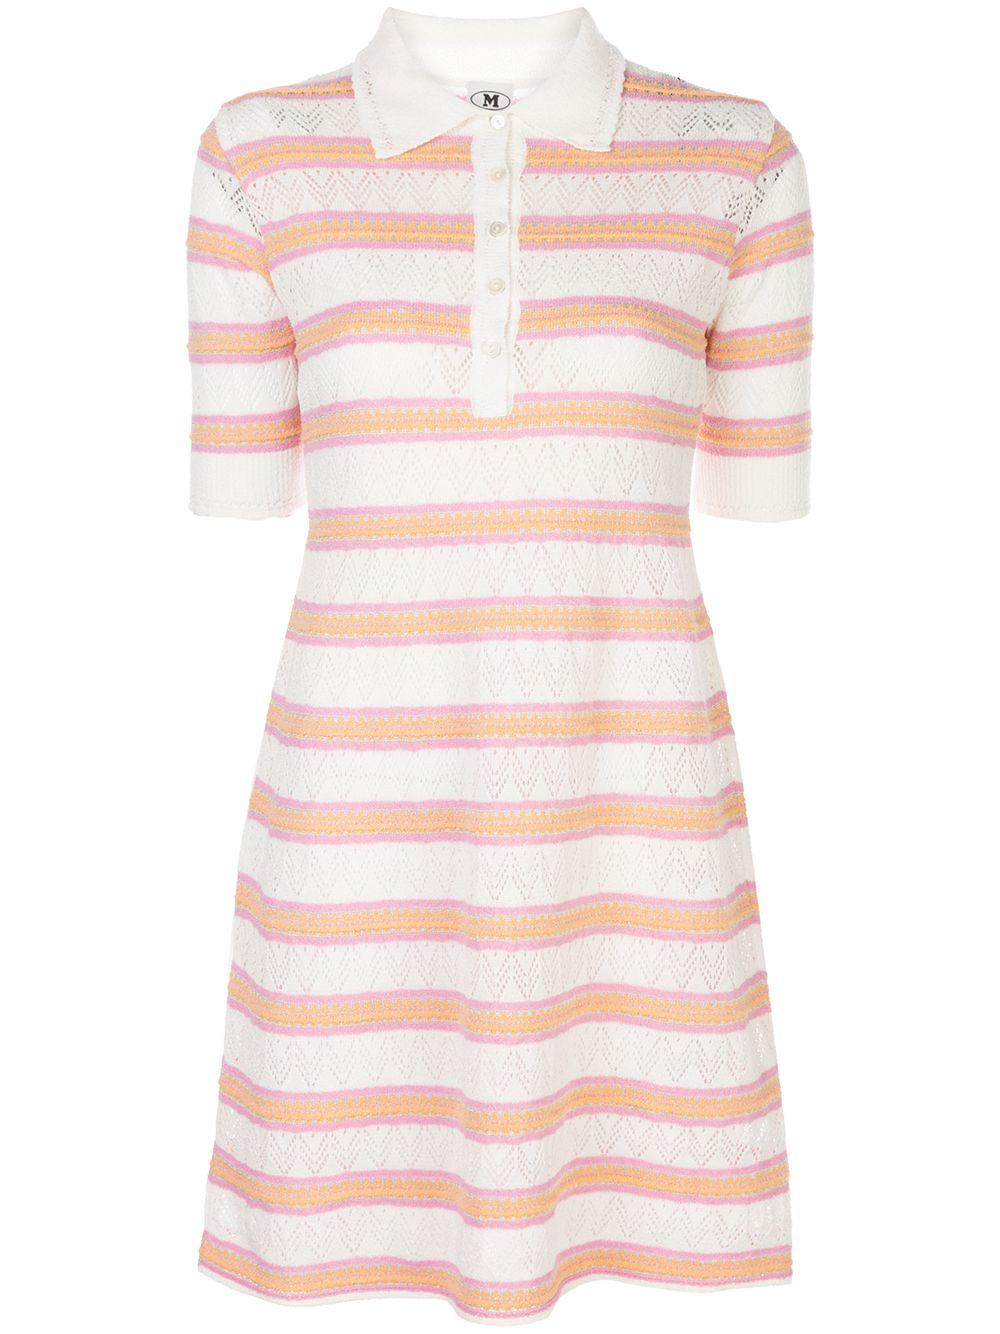 Short Sleeve Striped Polo Dress Item # 2DG00299-2K004B